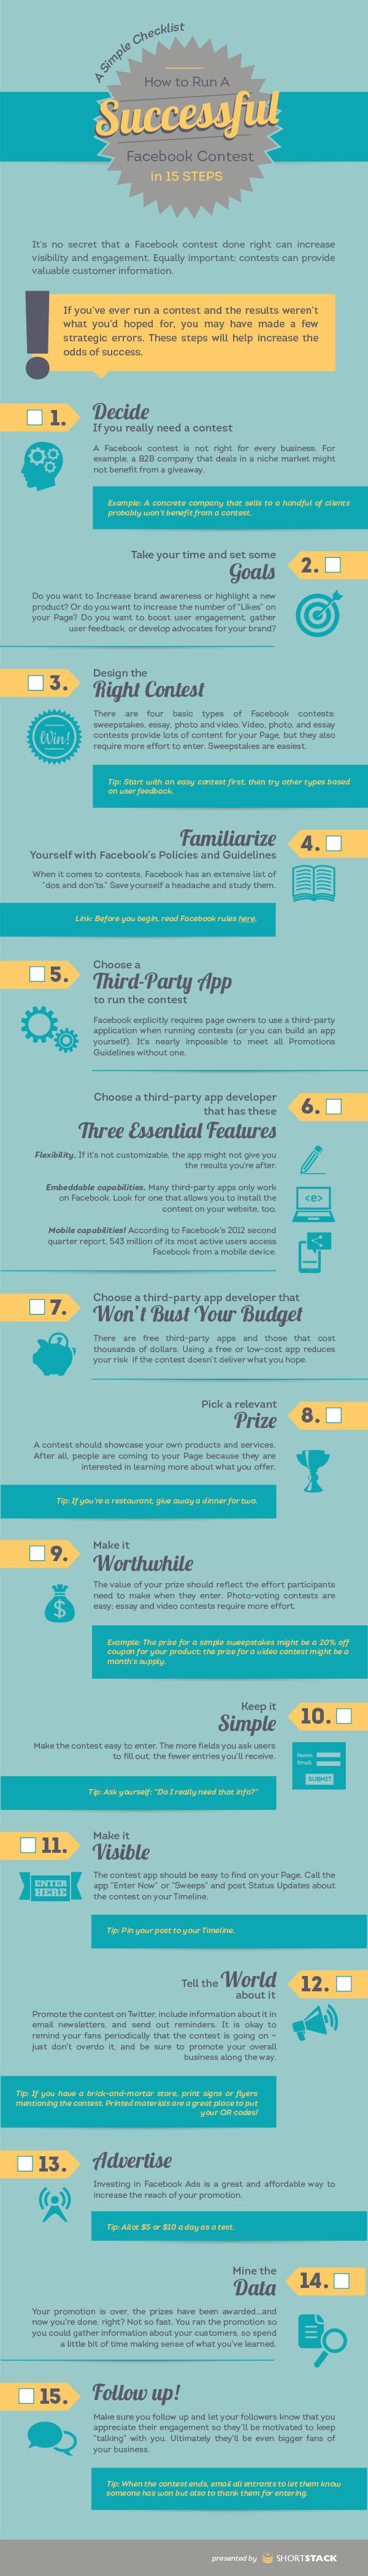 Infographic για επιτυχημένους Facebook διαγωνισμούς